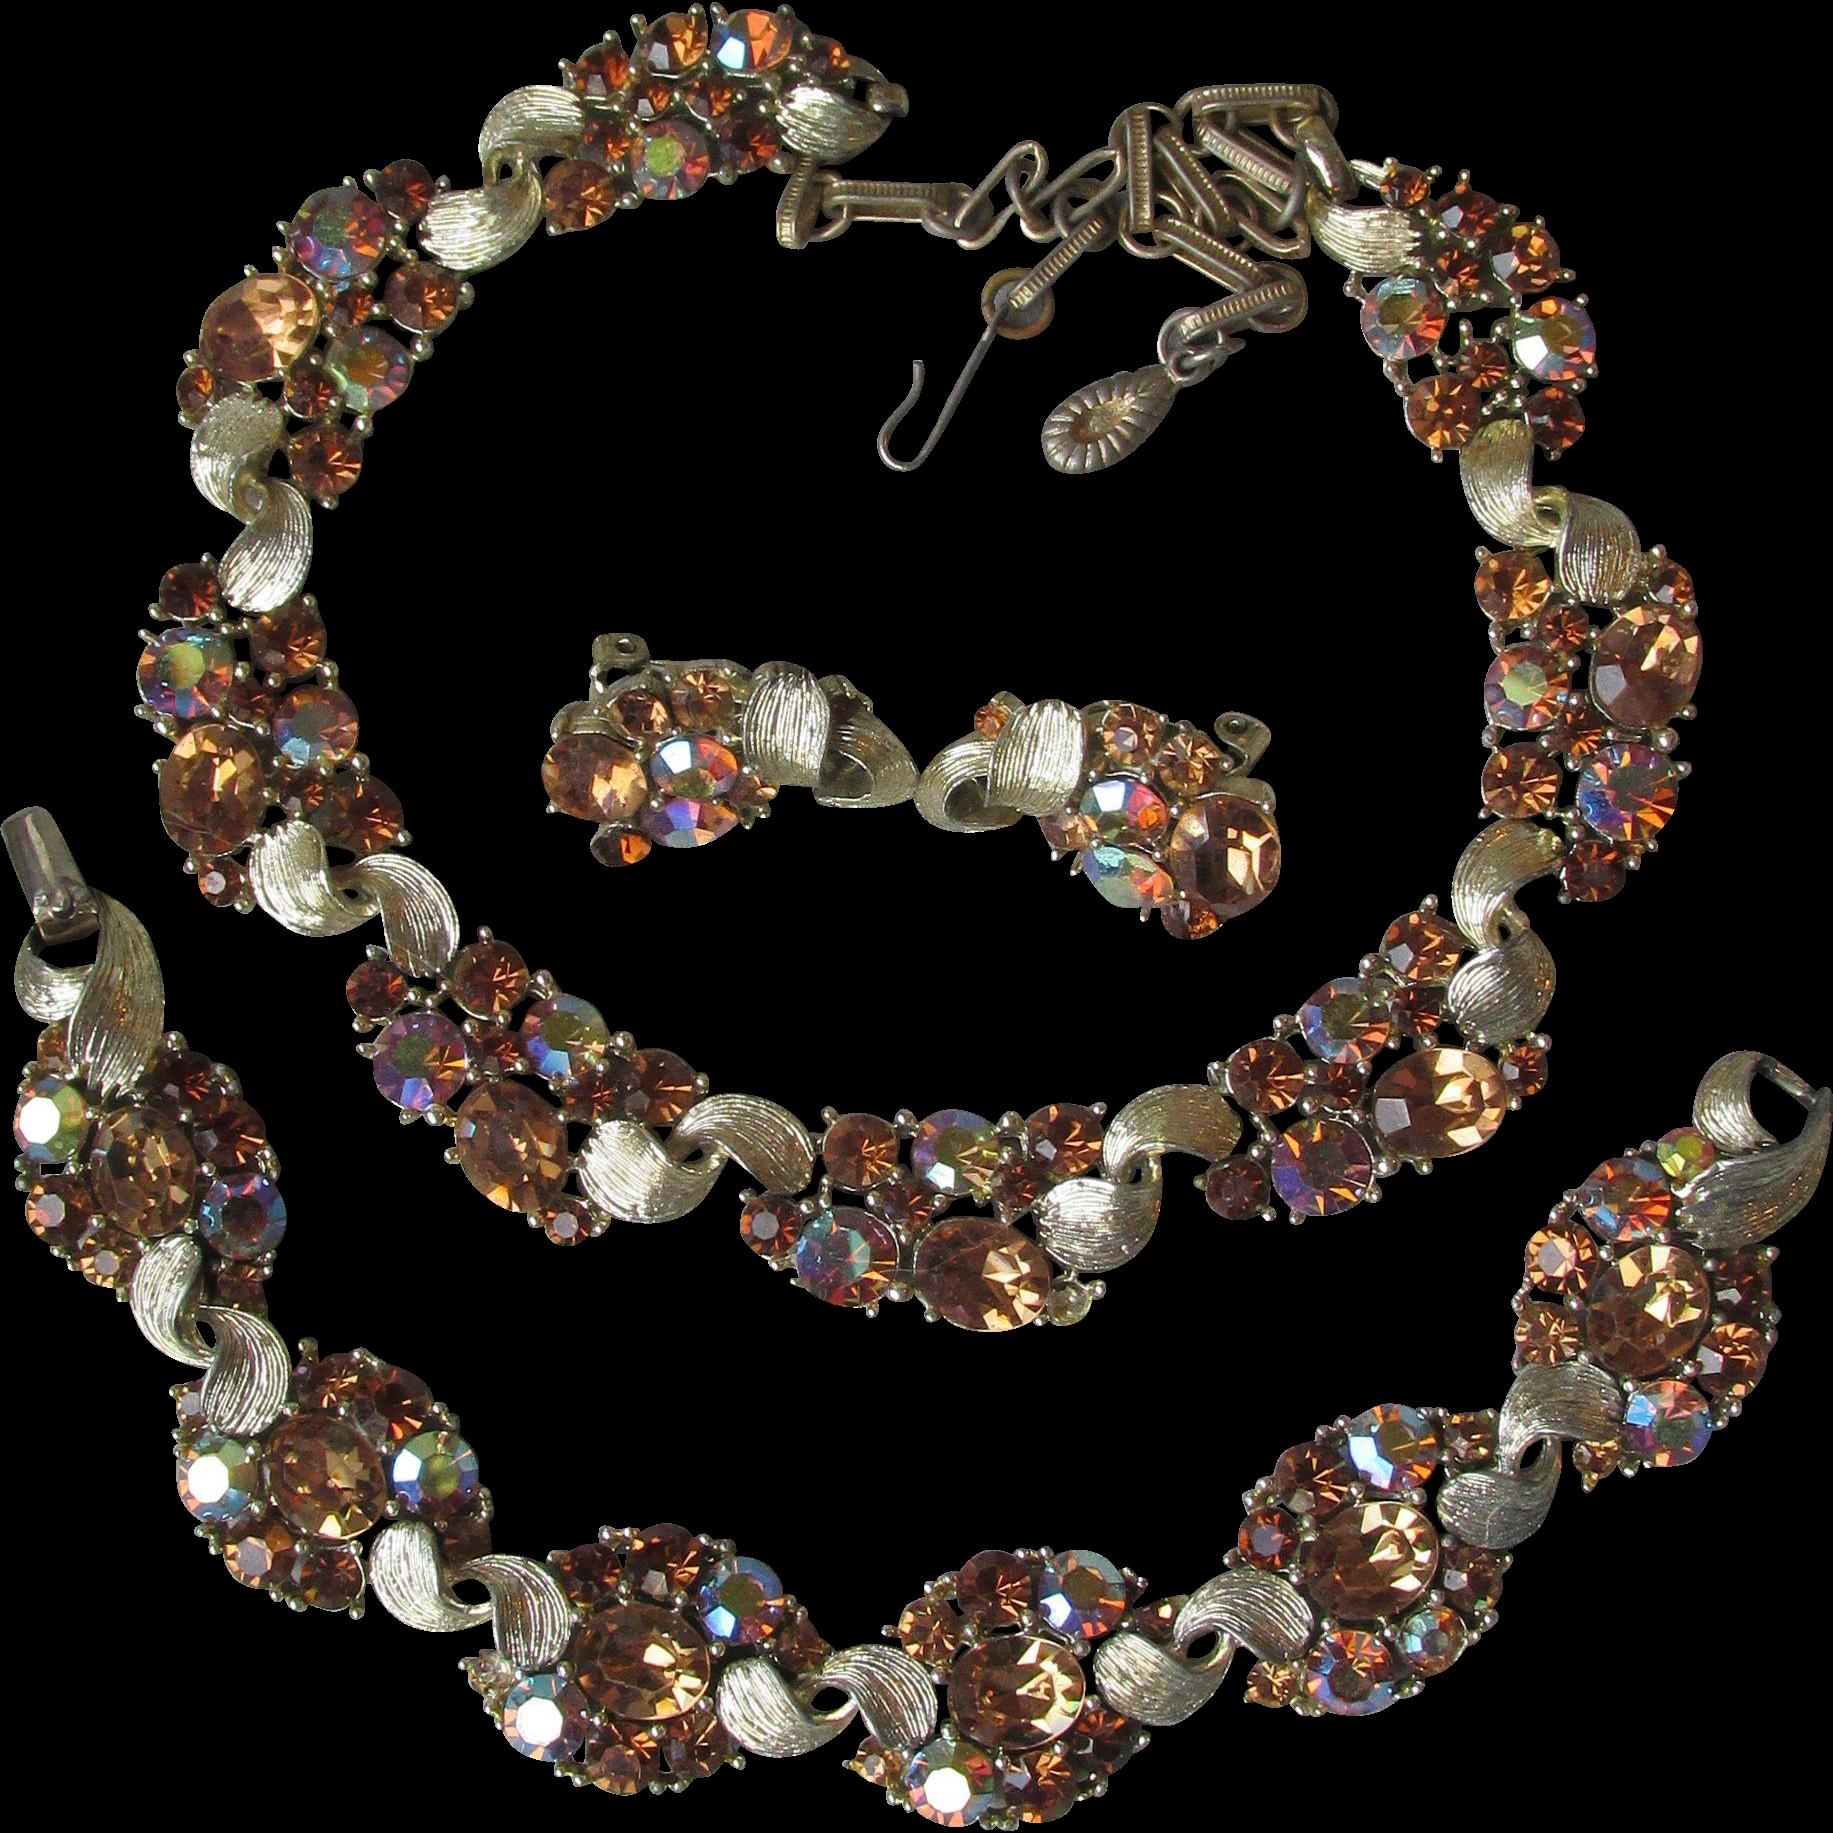 Sparkling Signed LISNER AB Root Beer Rhinestone Vintage Parure, Necklace, Bracelet, Earrings